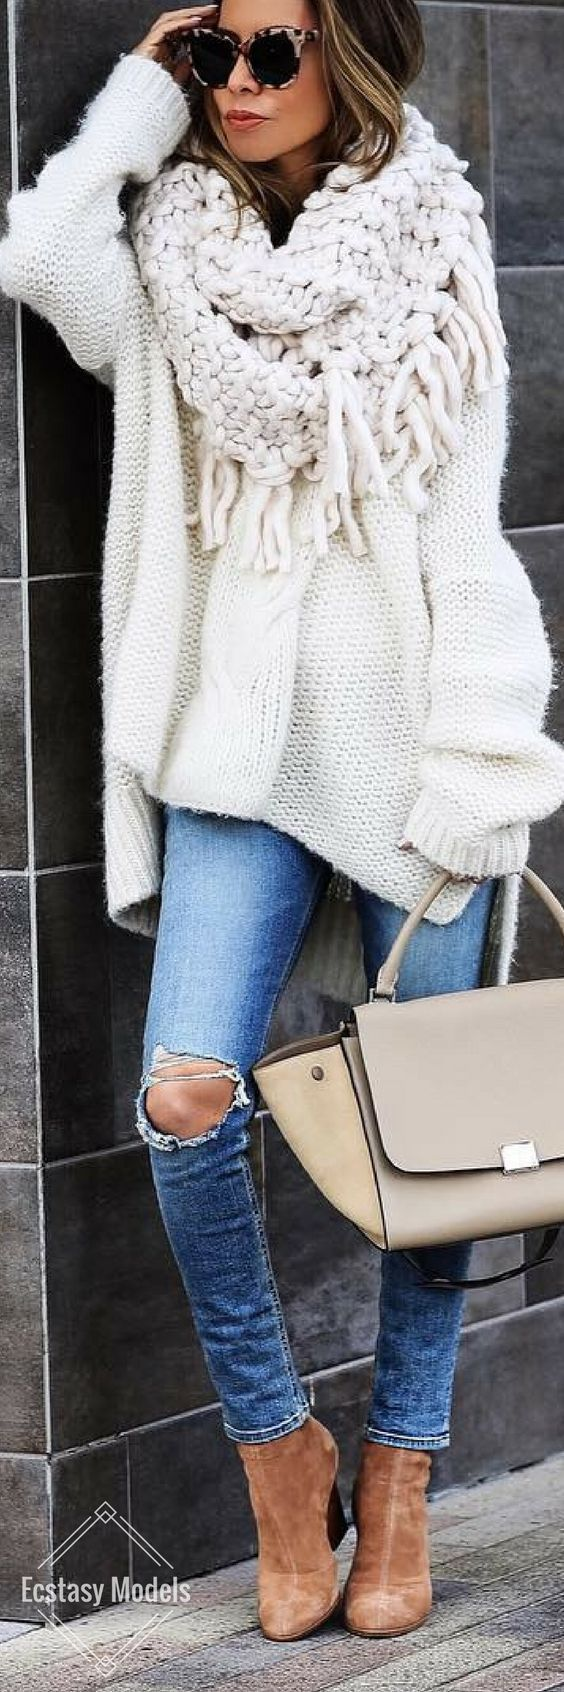 Best 25+ Cozy winter fashion ideas on Pinterest   Cozy ...